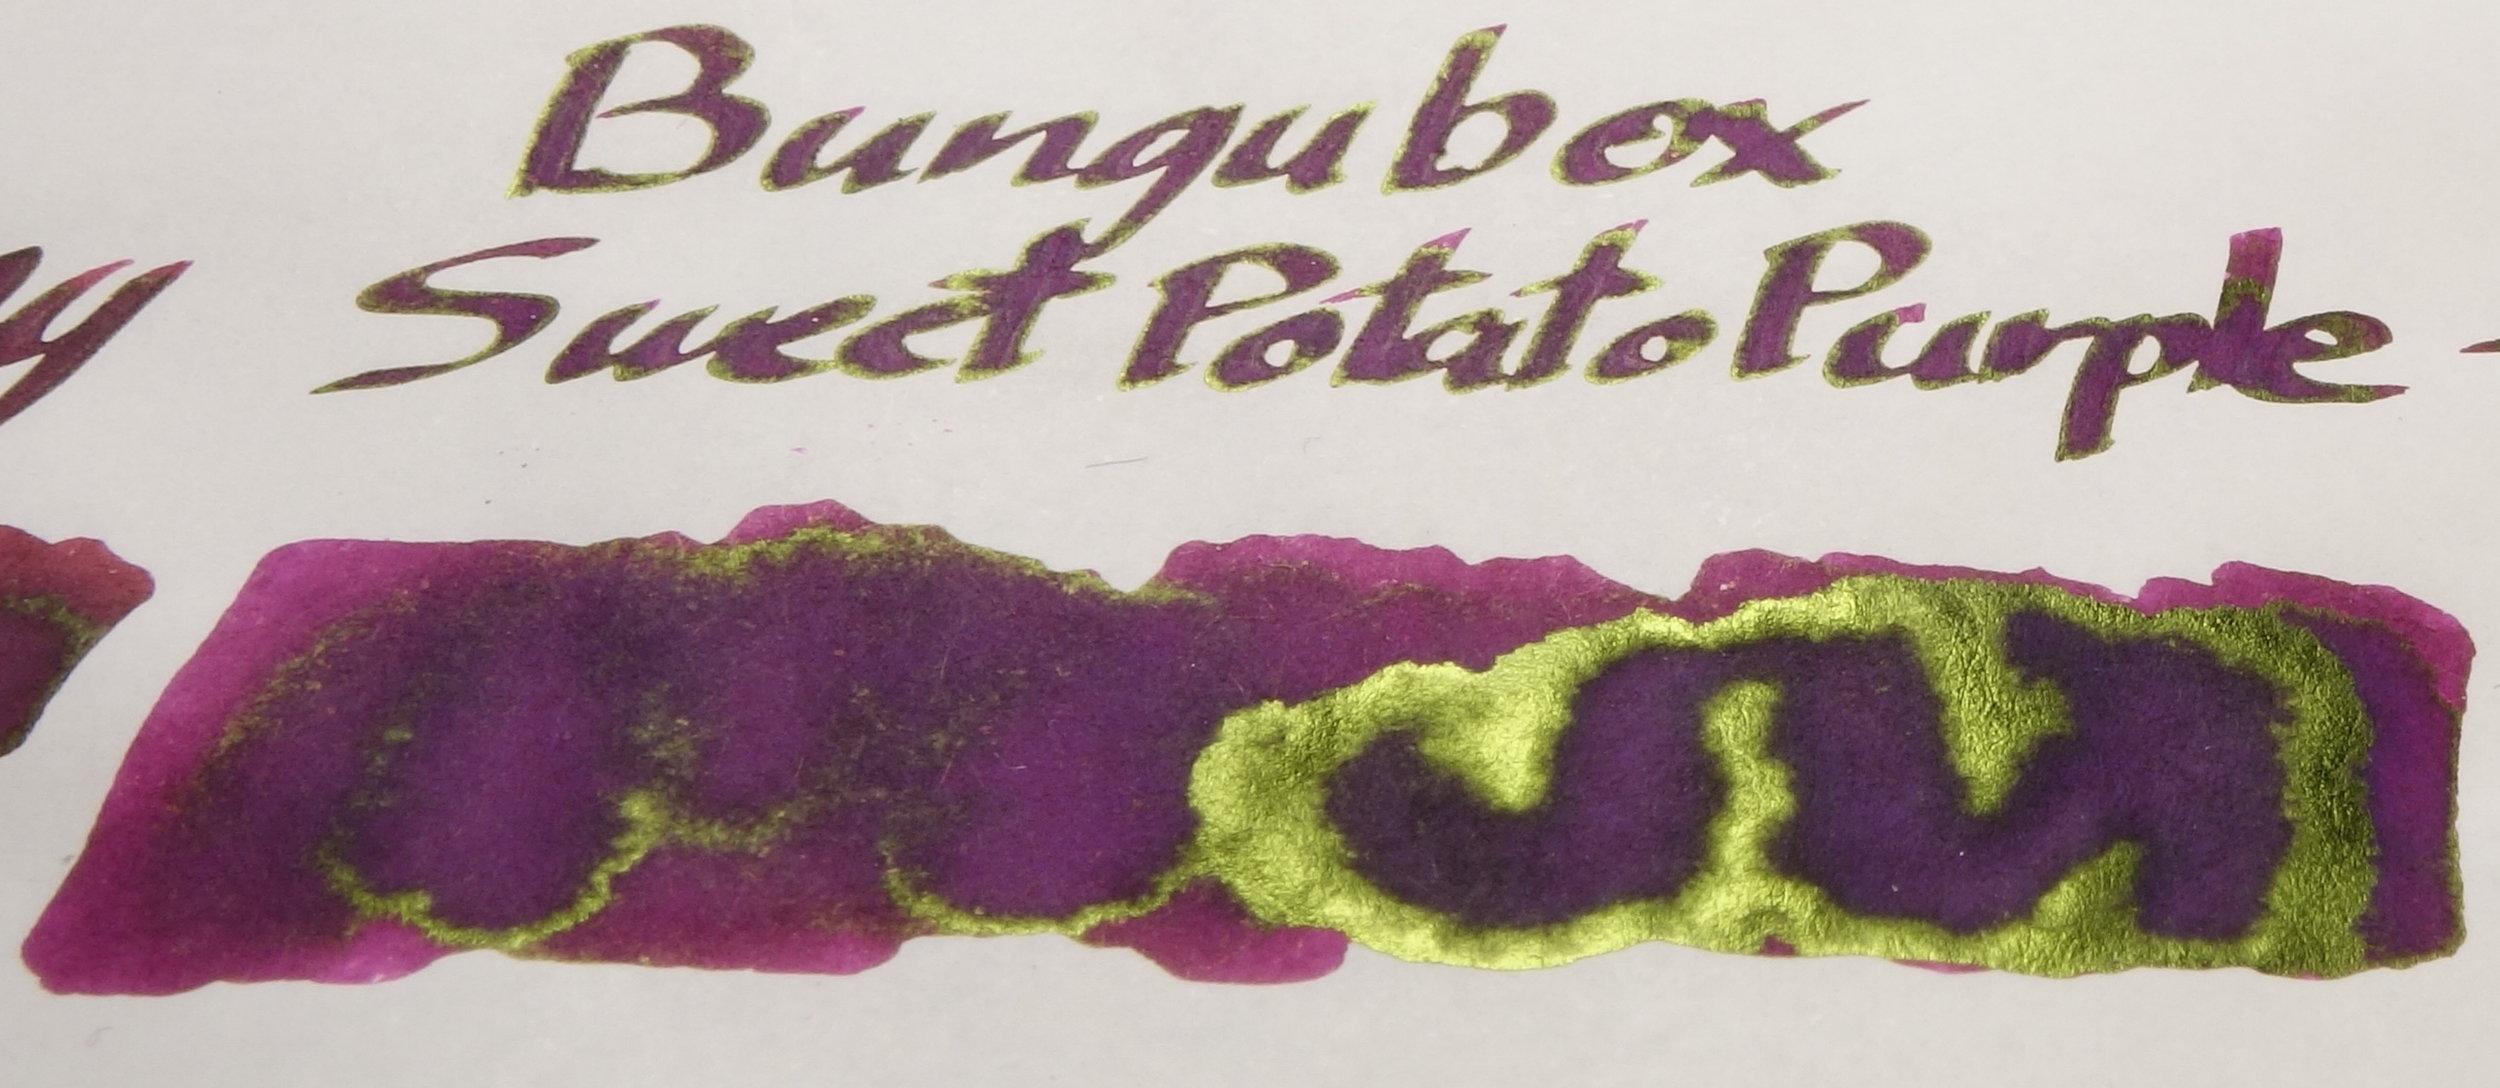 Sheen Bungubox Sweet Potato Purple.JPG